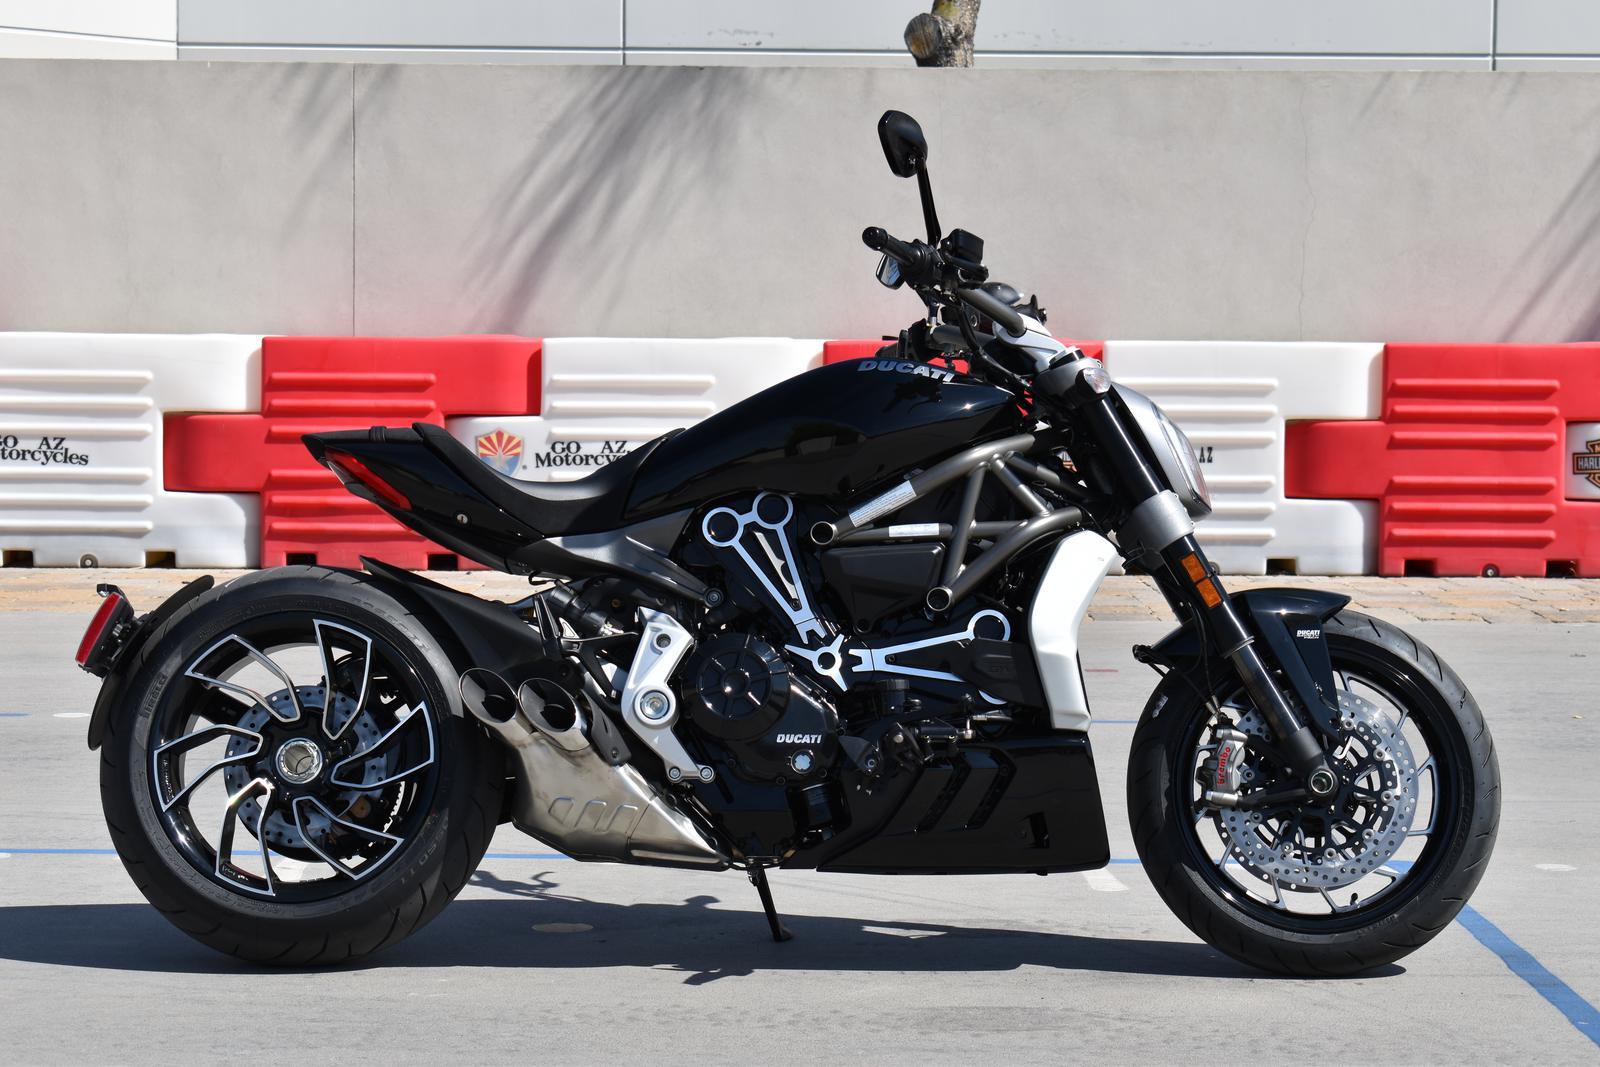 2019 Ducati Xdiavel S Go Az Motorcycles